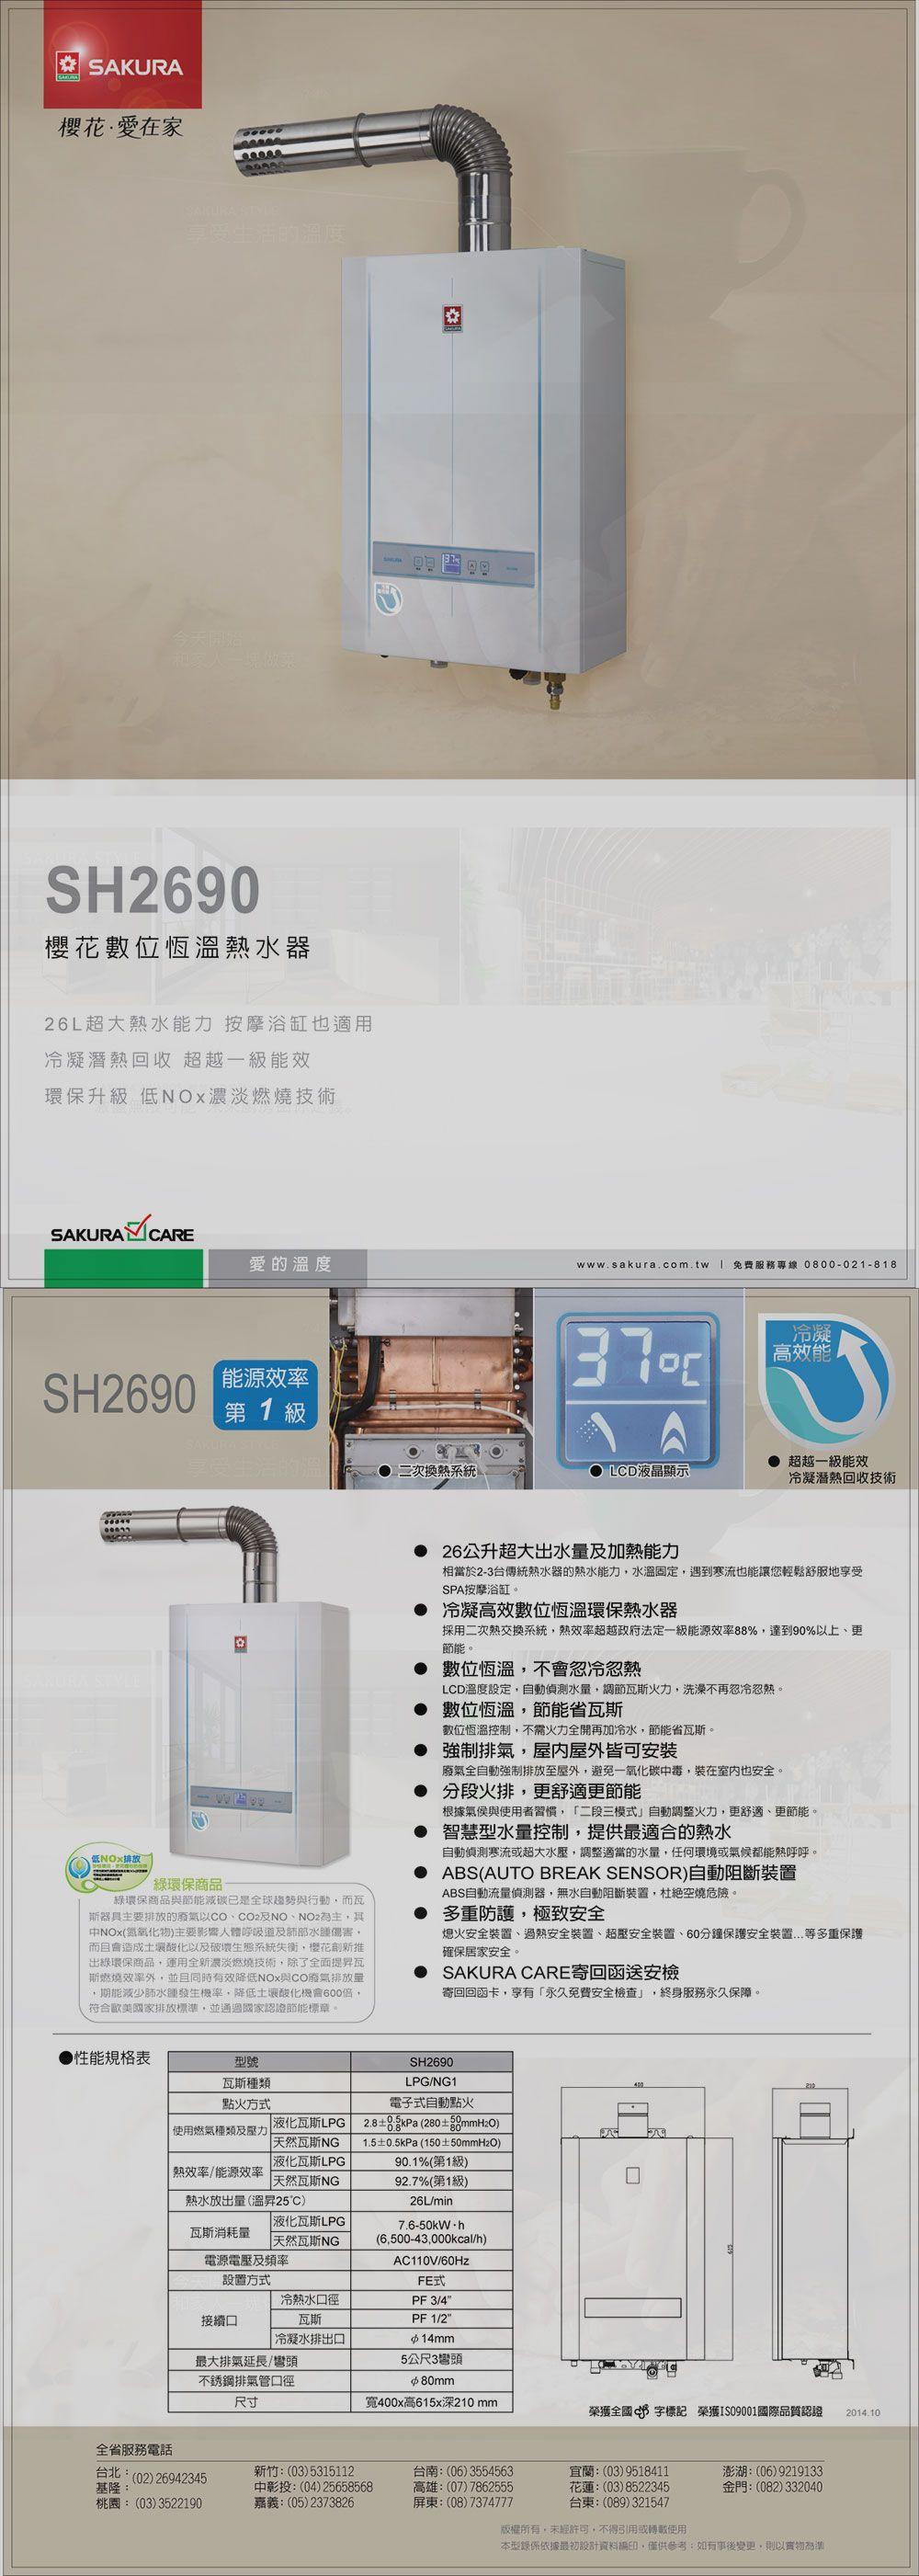 PK/goods/SAKURA/精品館/SH2690-DM.jpg